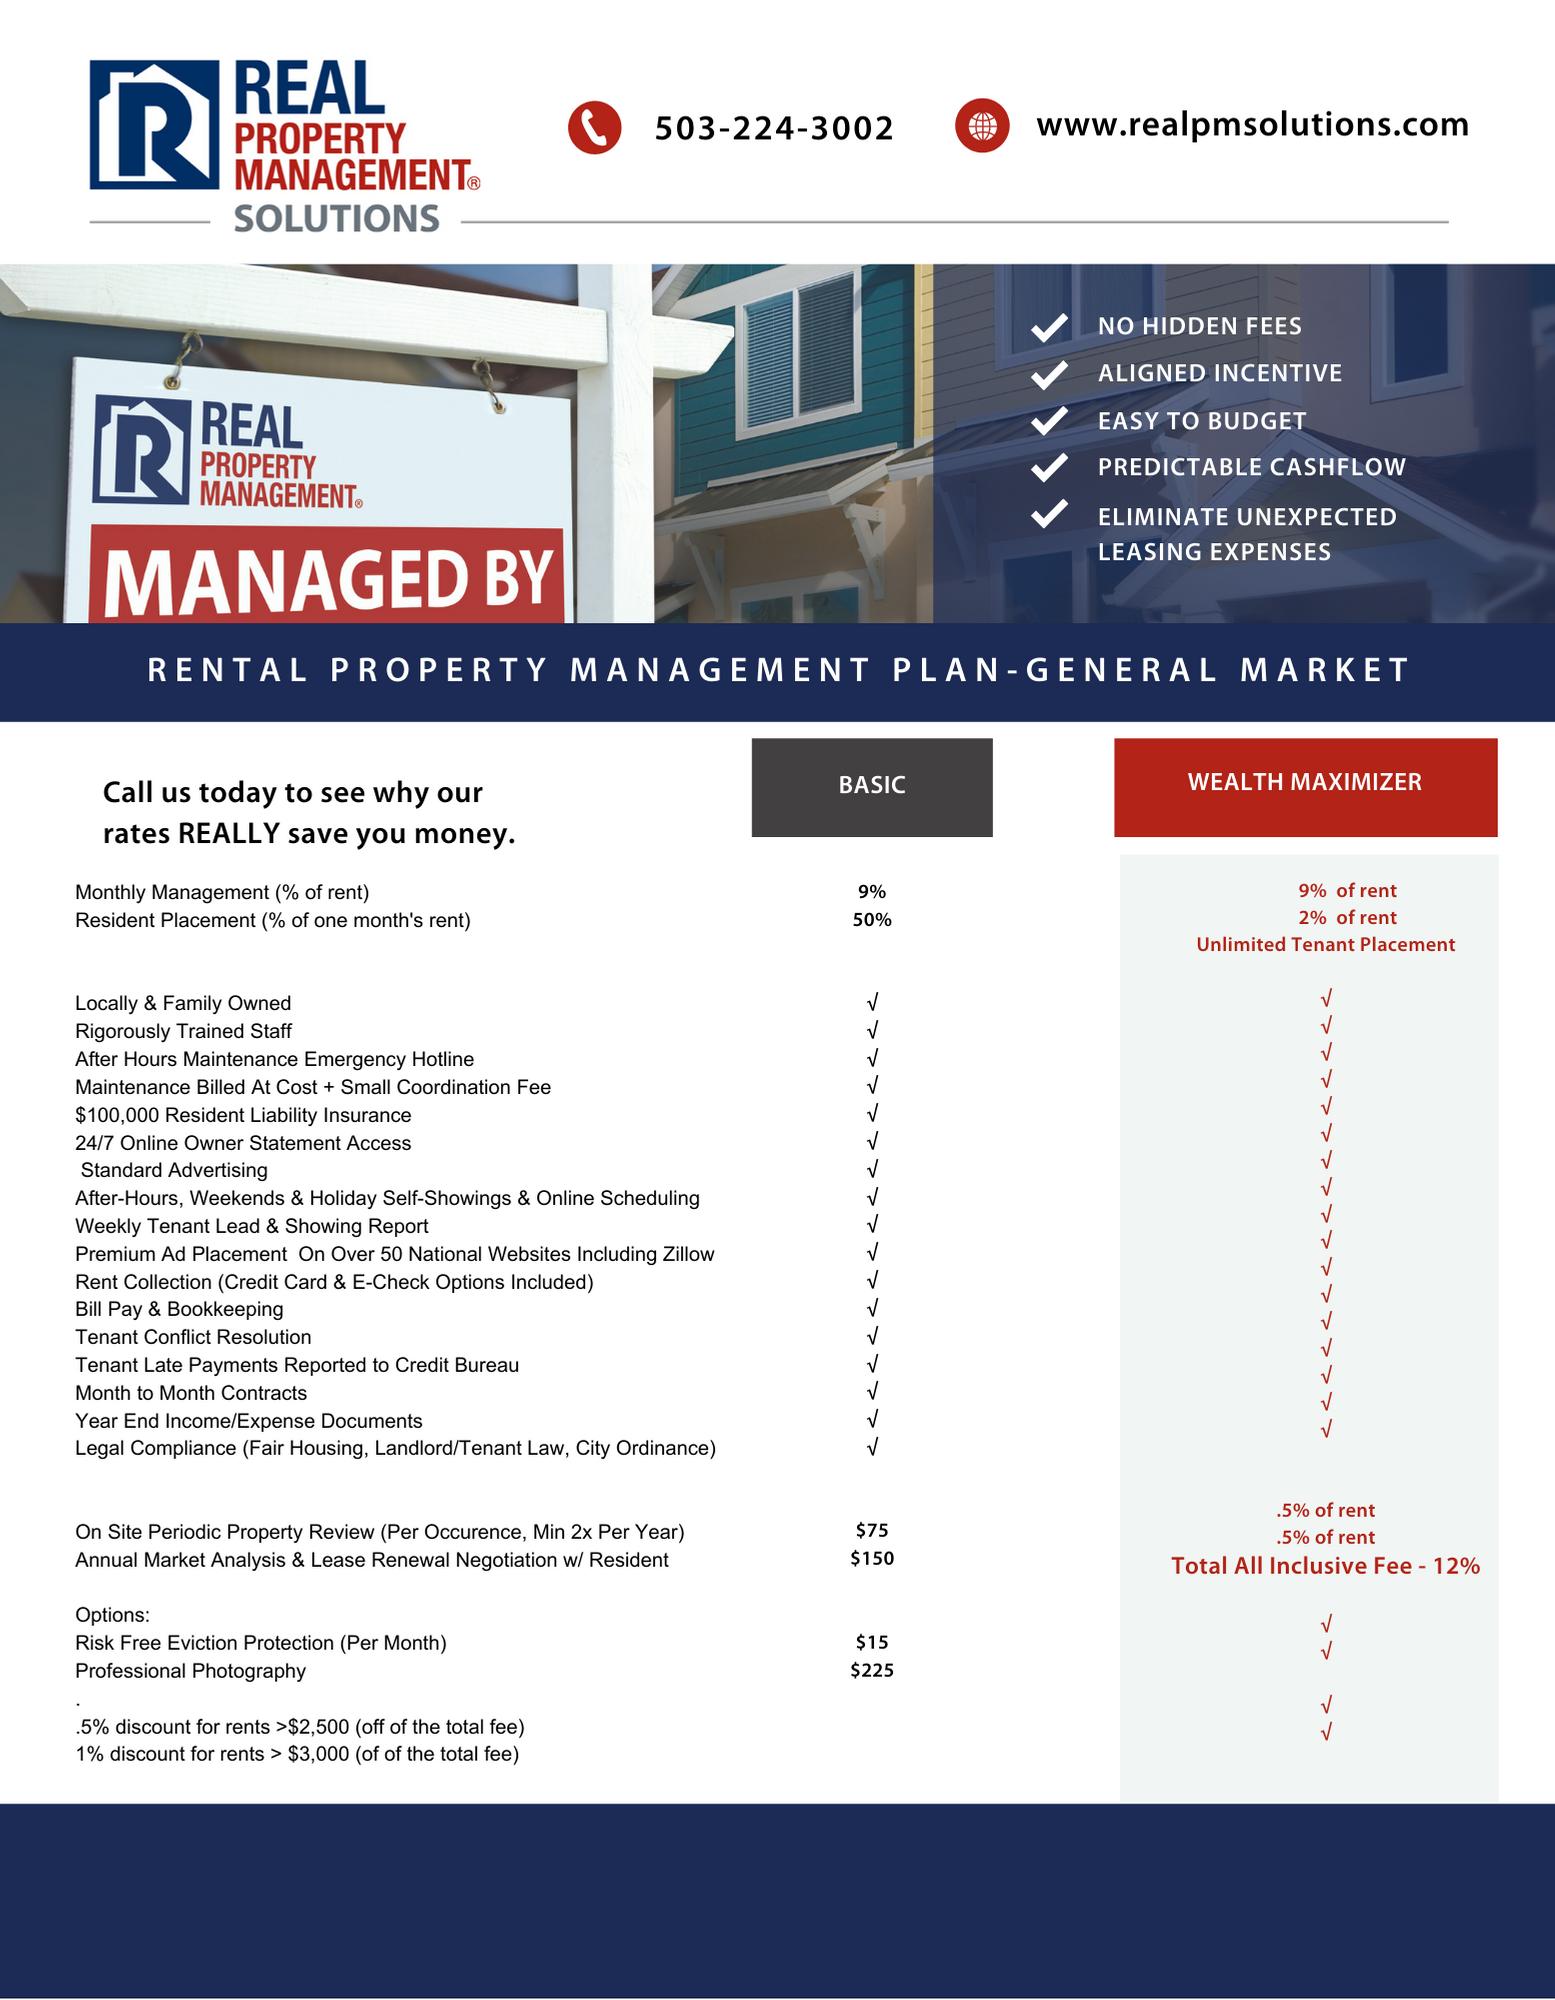 Rental Property Management Solutions General Market Pricing Structure